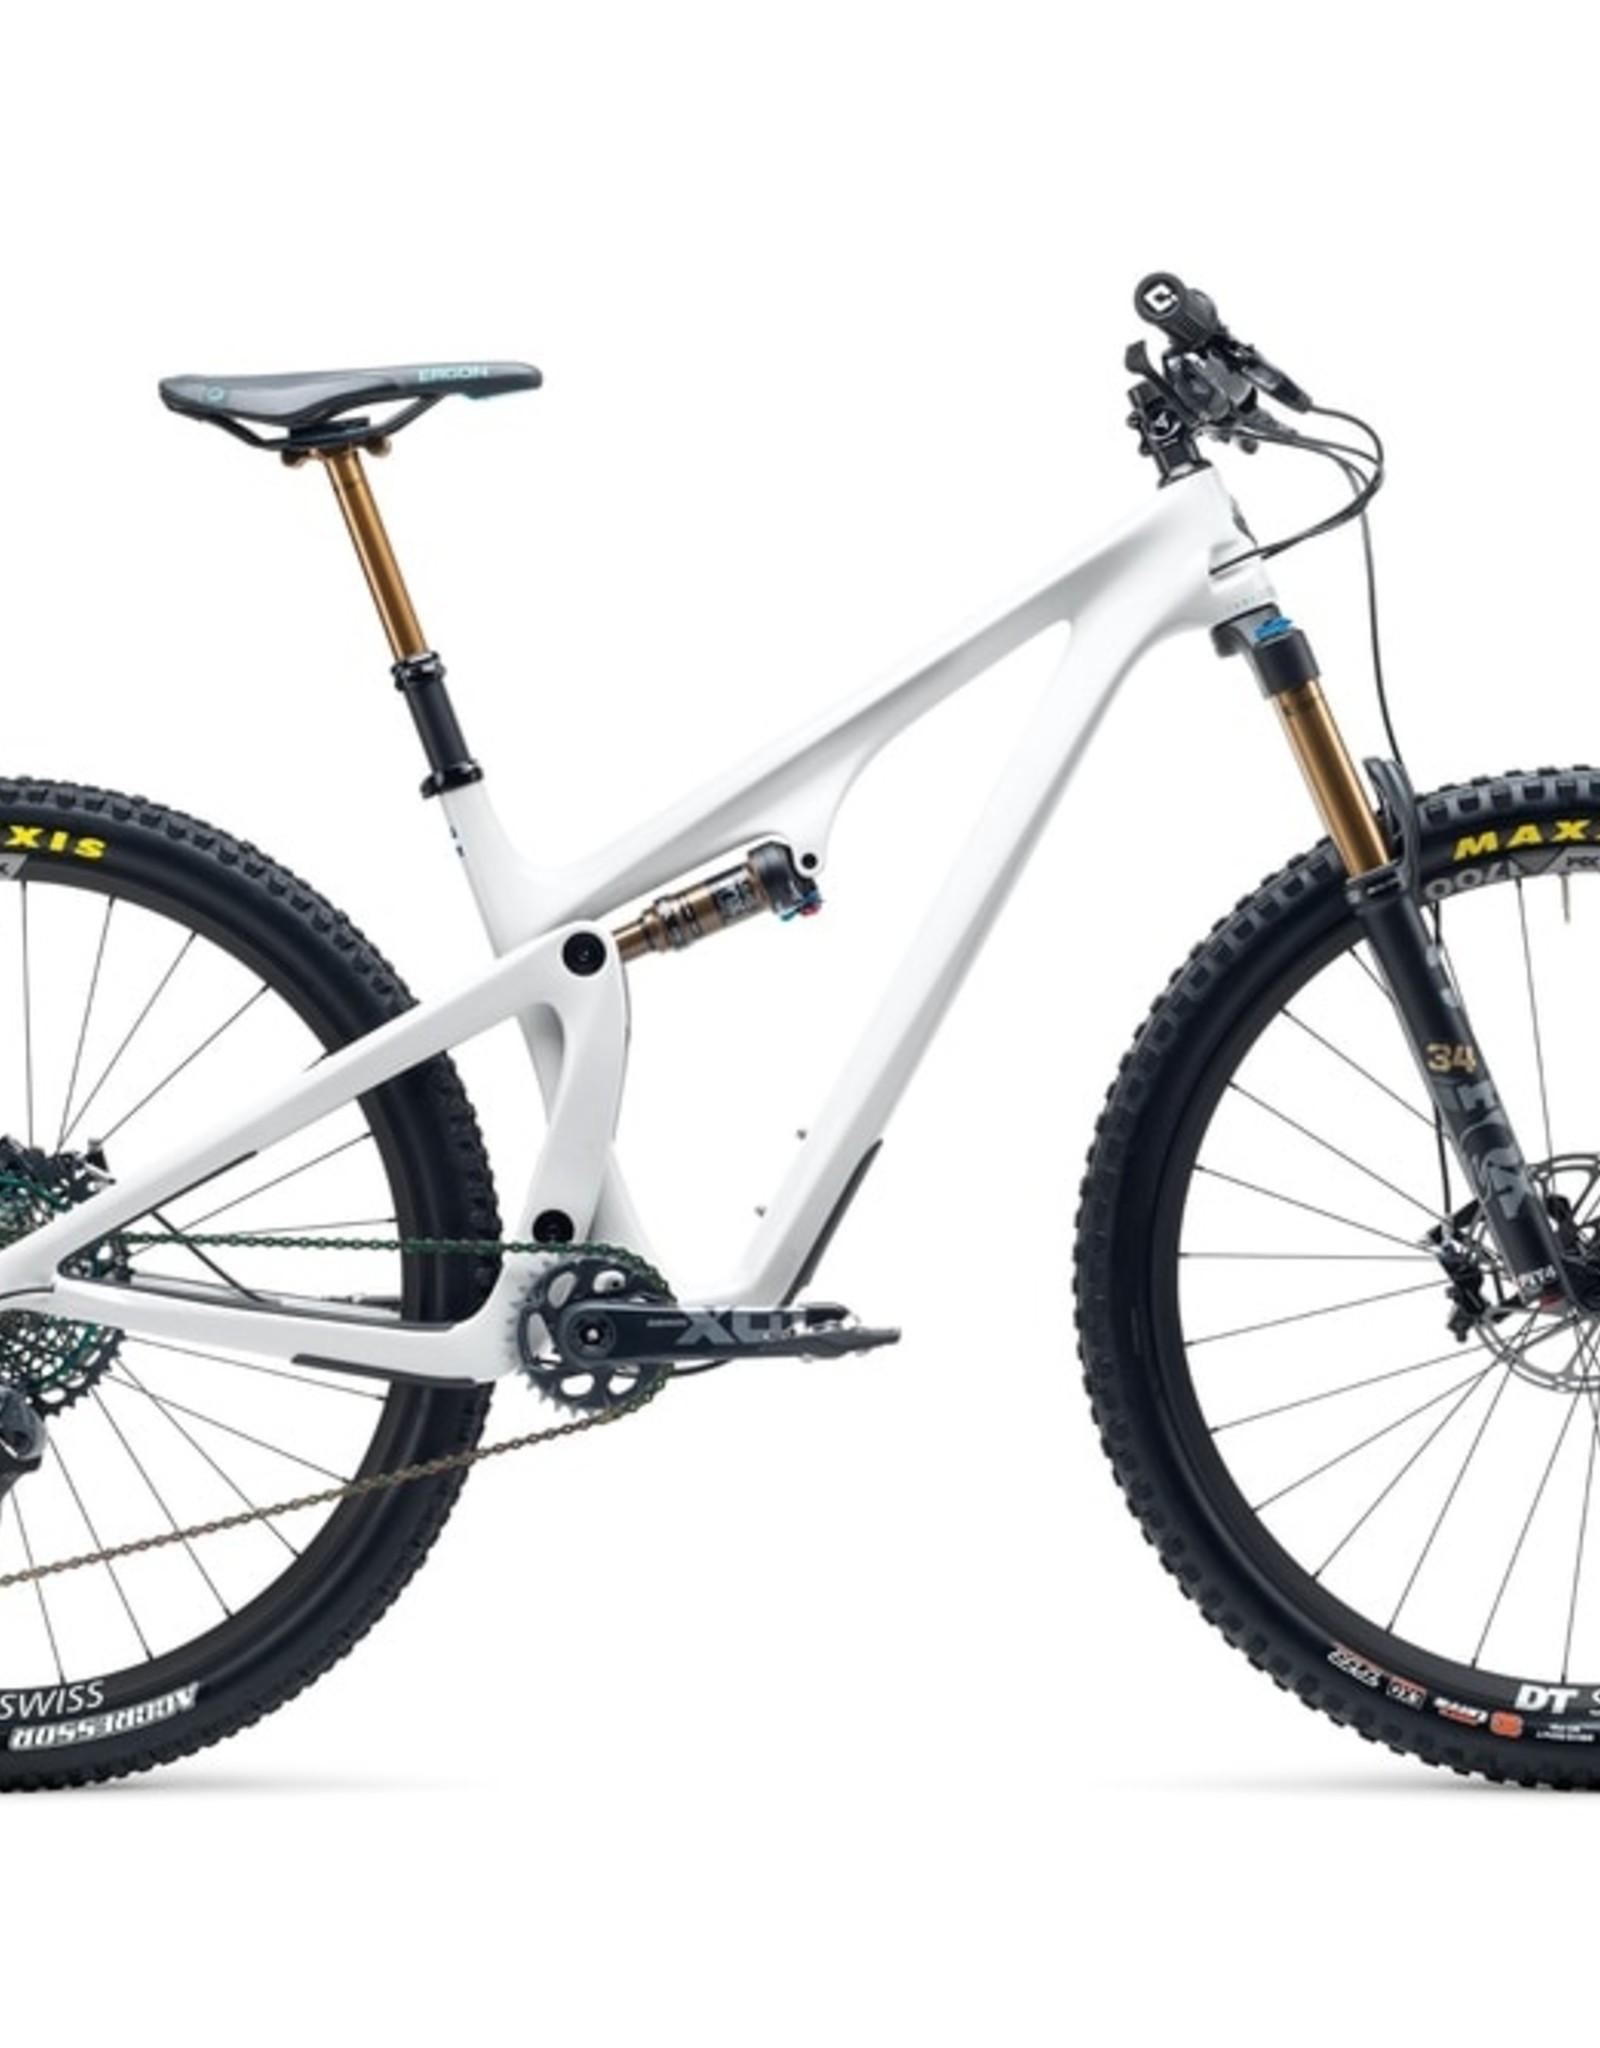 Yeti Cycles SB115 T-SERIES